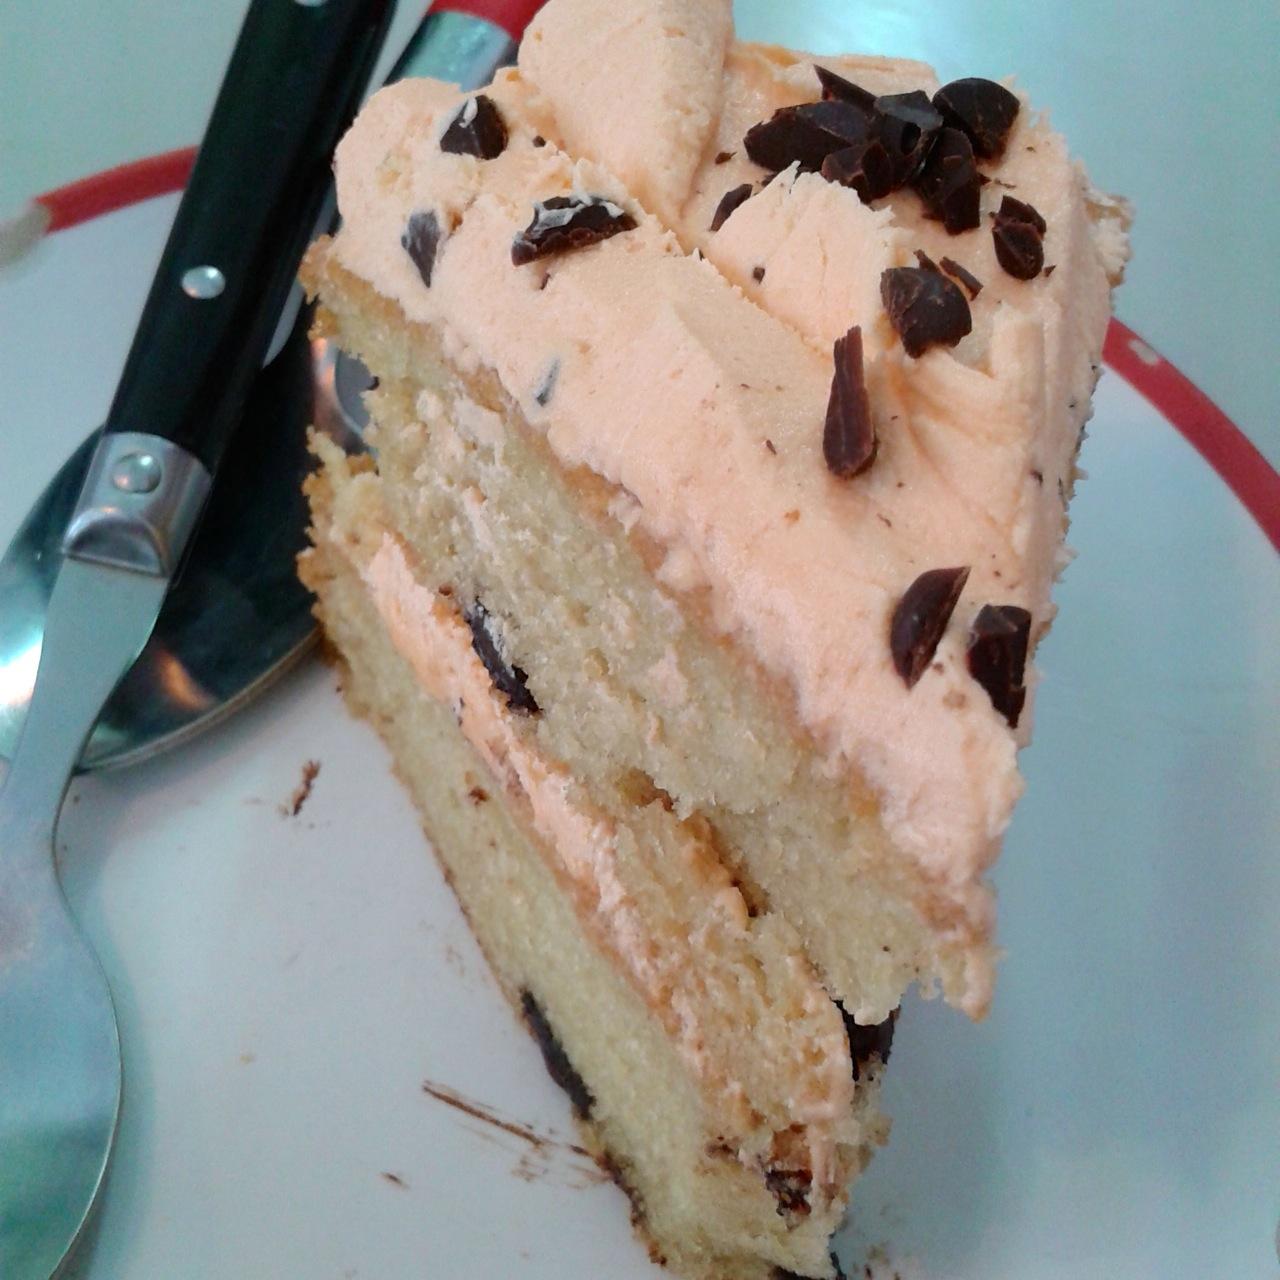 https://i0.wp.com/fatgayvegan.com/wp-content/uploads/2014/06/cake.jpg?fit=1280%2C1280